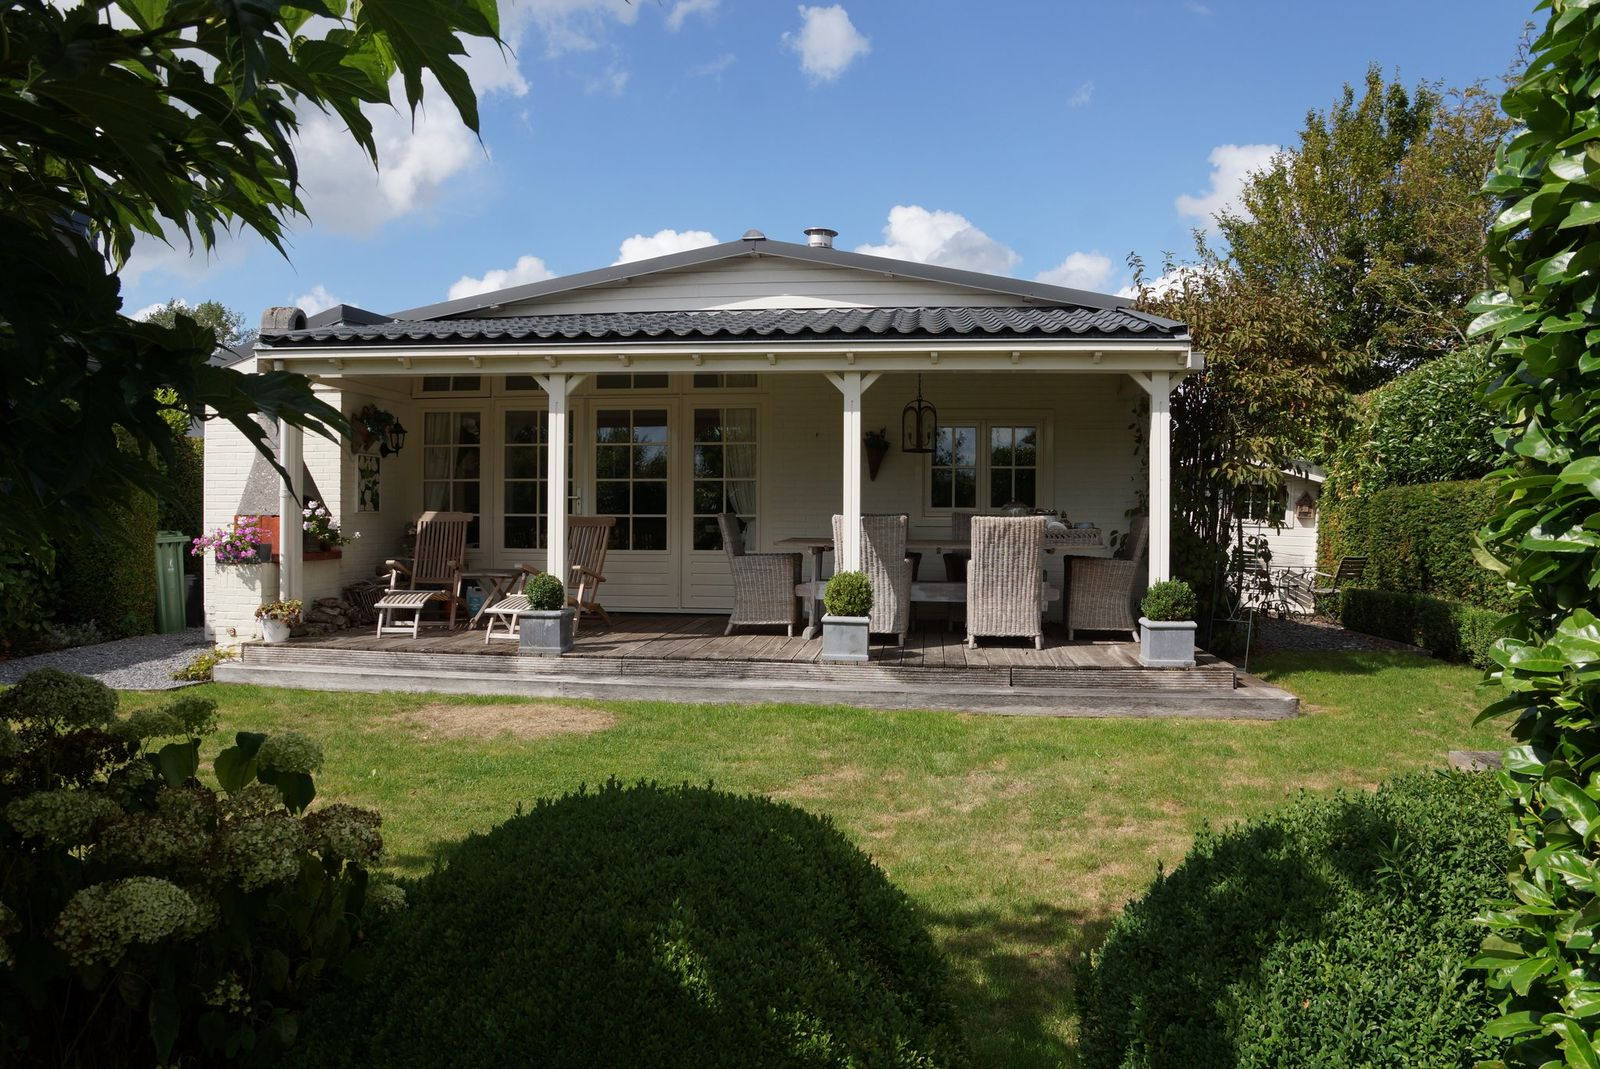 Park Zomerlust 132, Zevenhoven